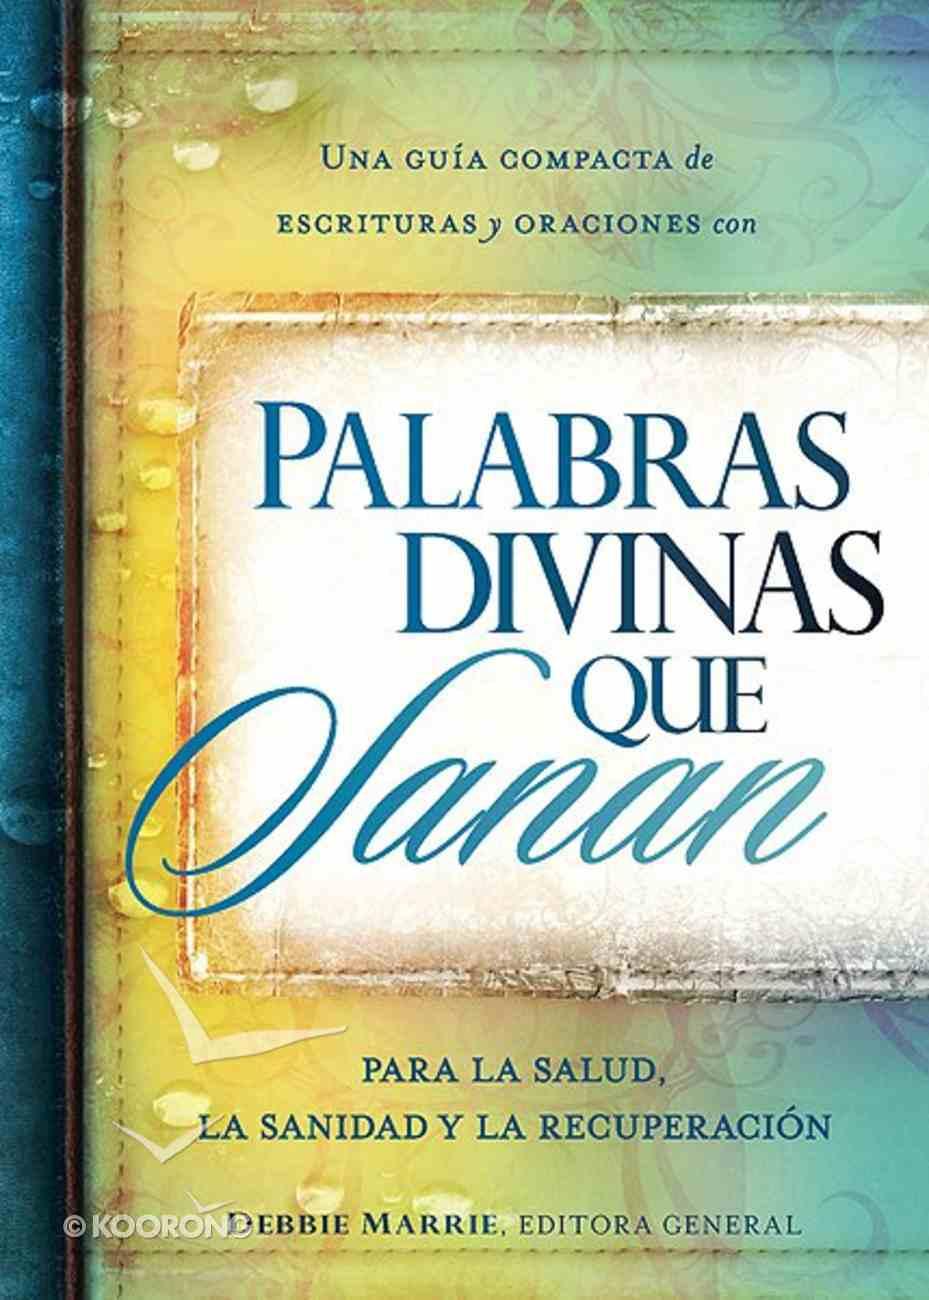 Palabras Divinas Que Sanan (Divine Words That Heal) Paperback